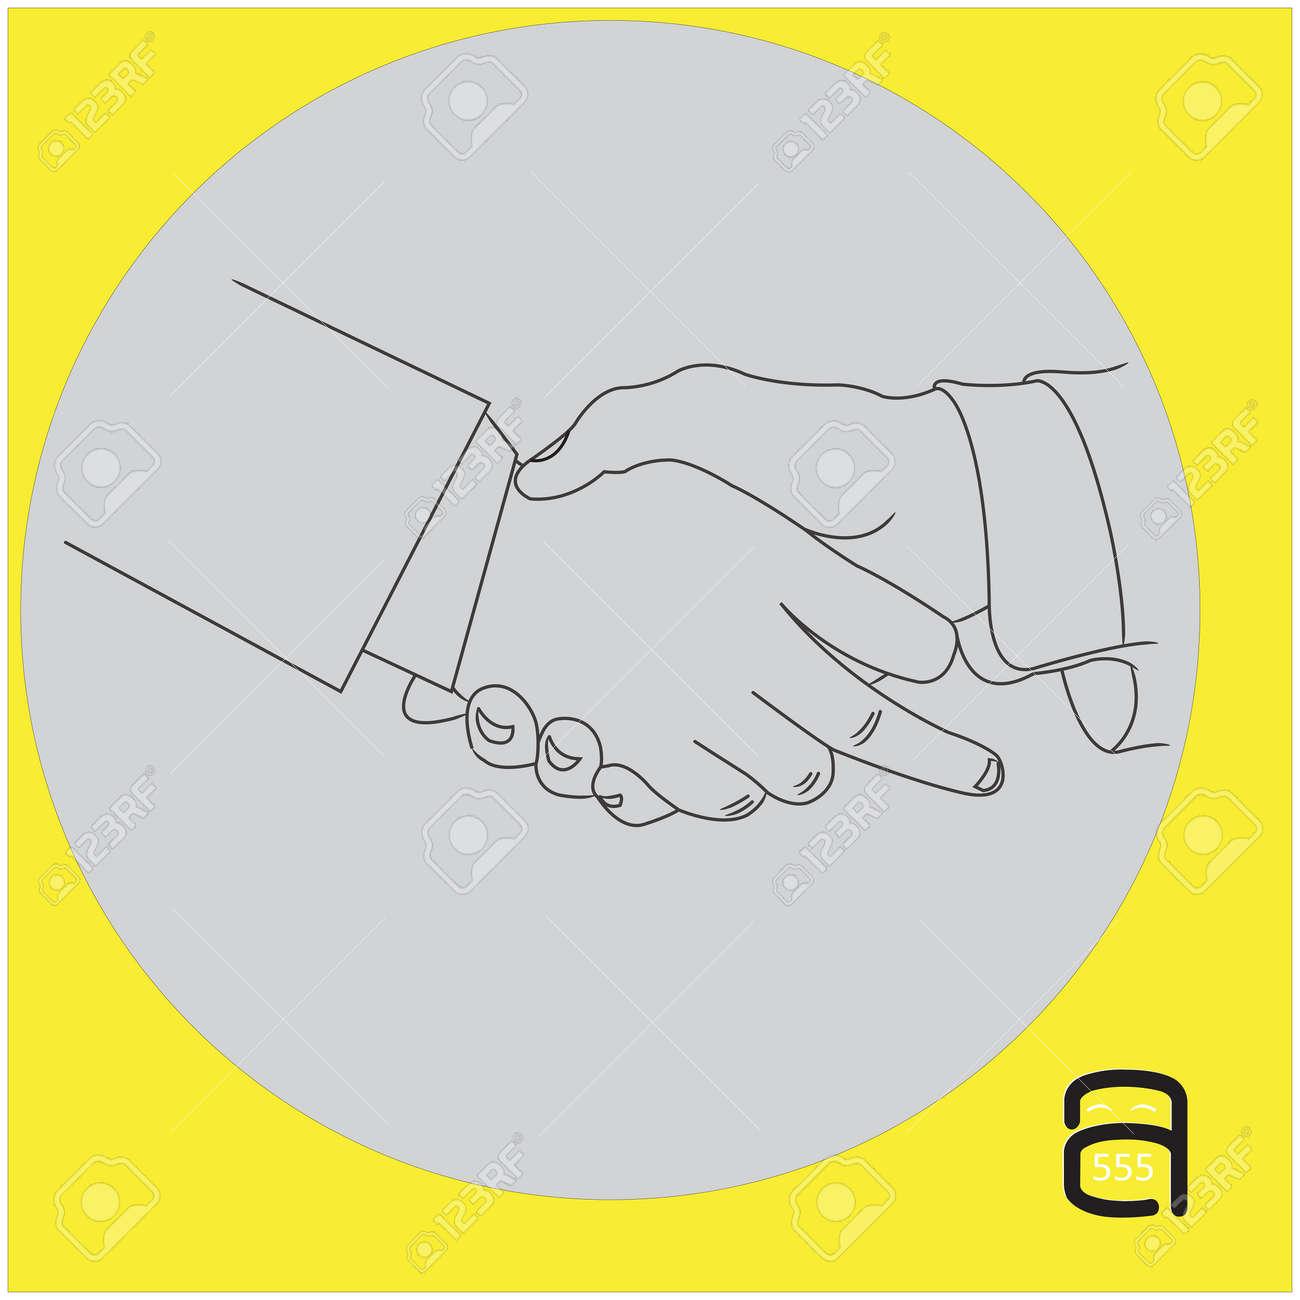 handshake businessman with showing middle finger - vector